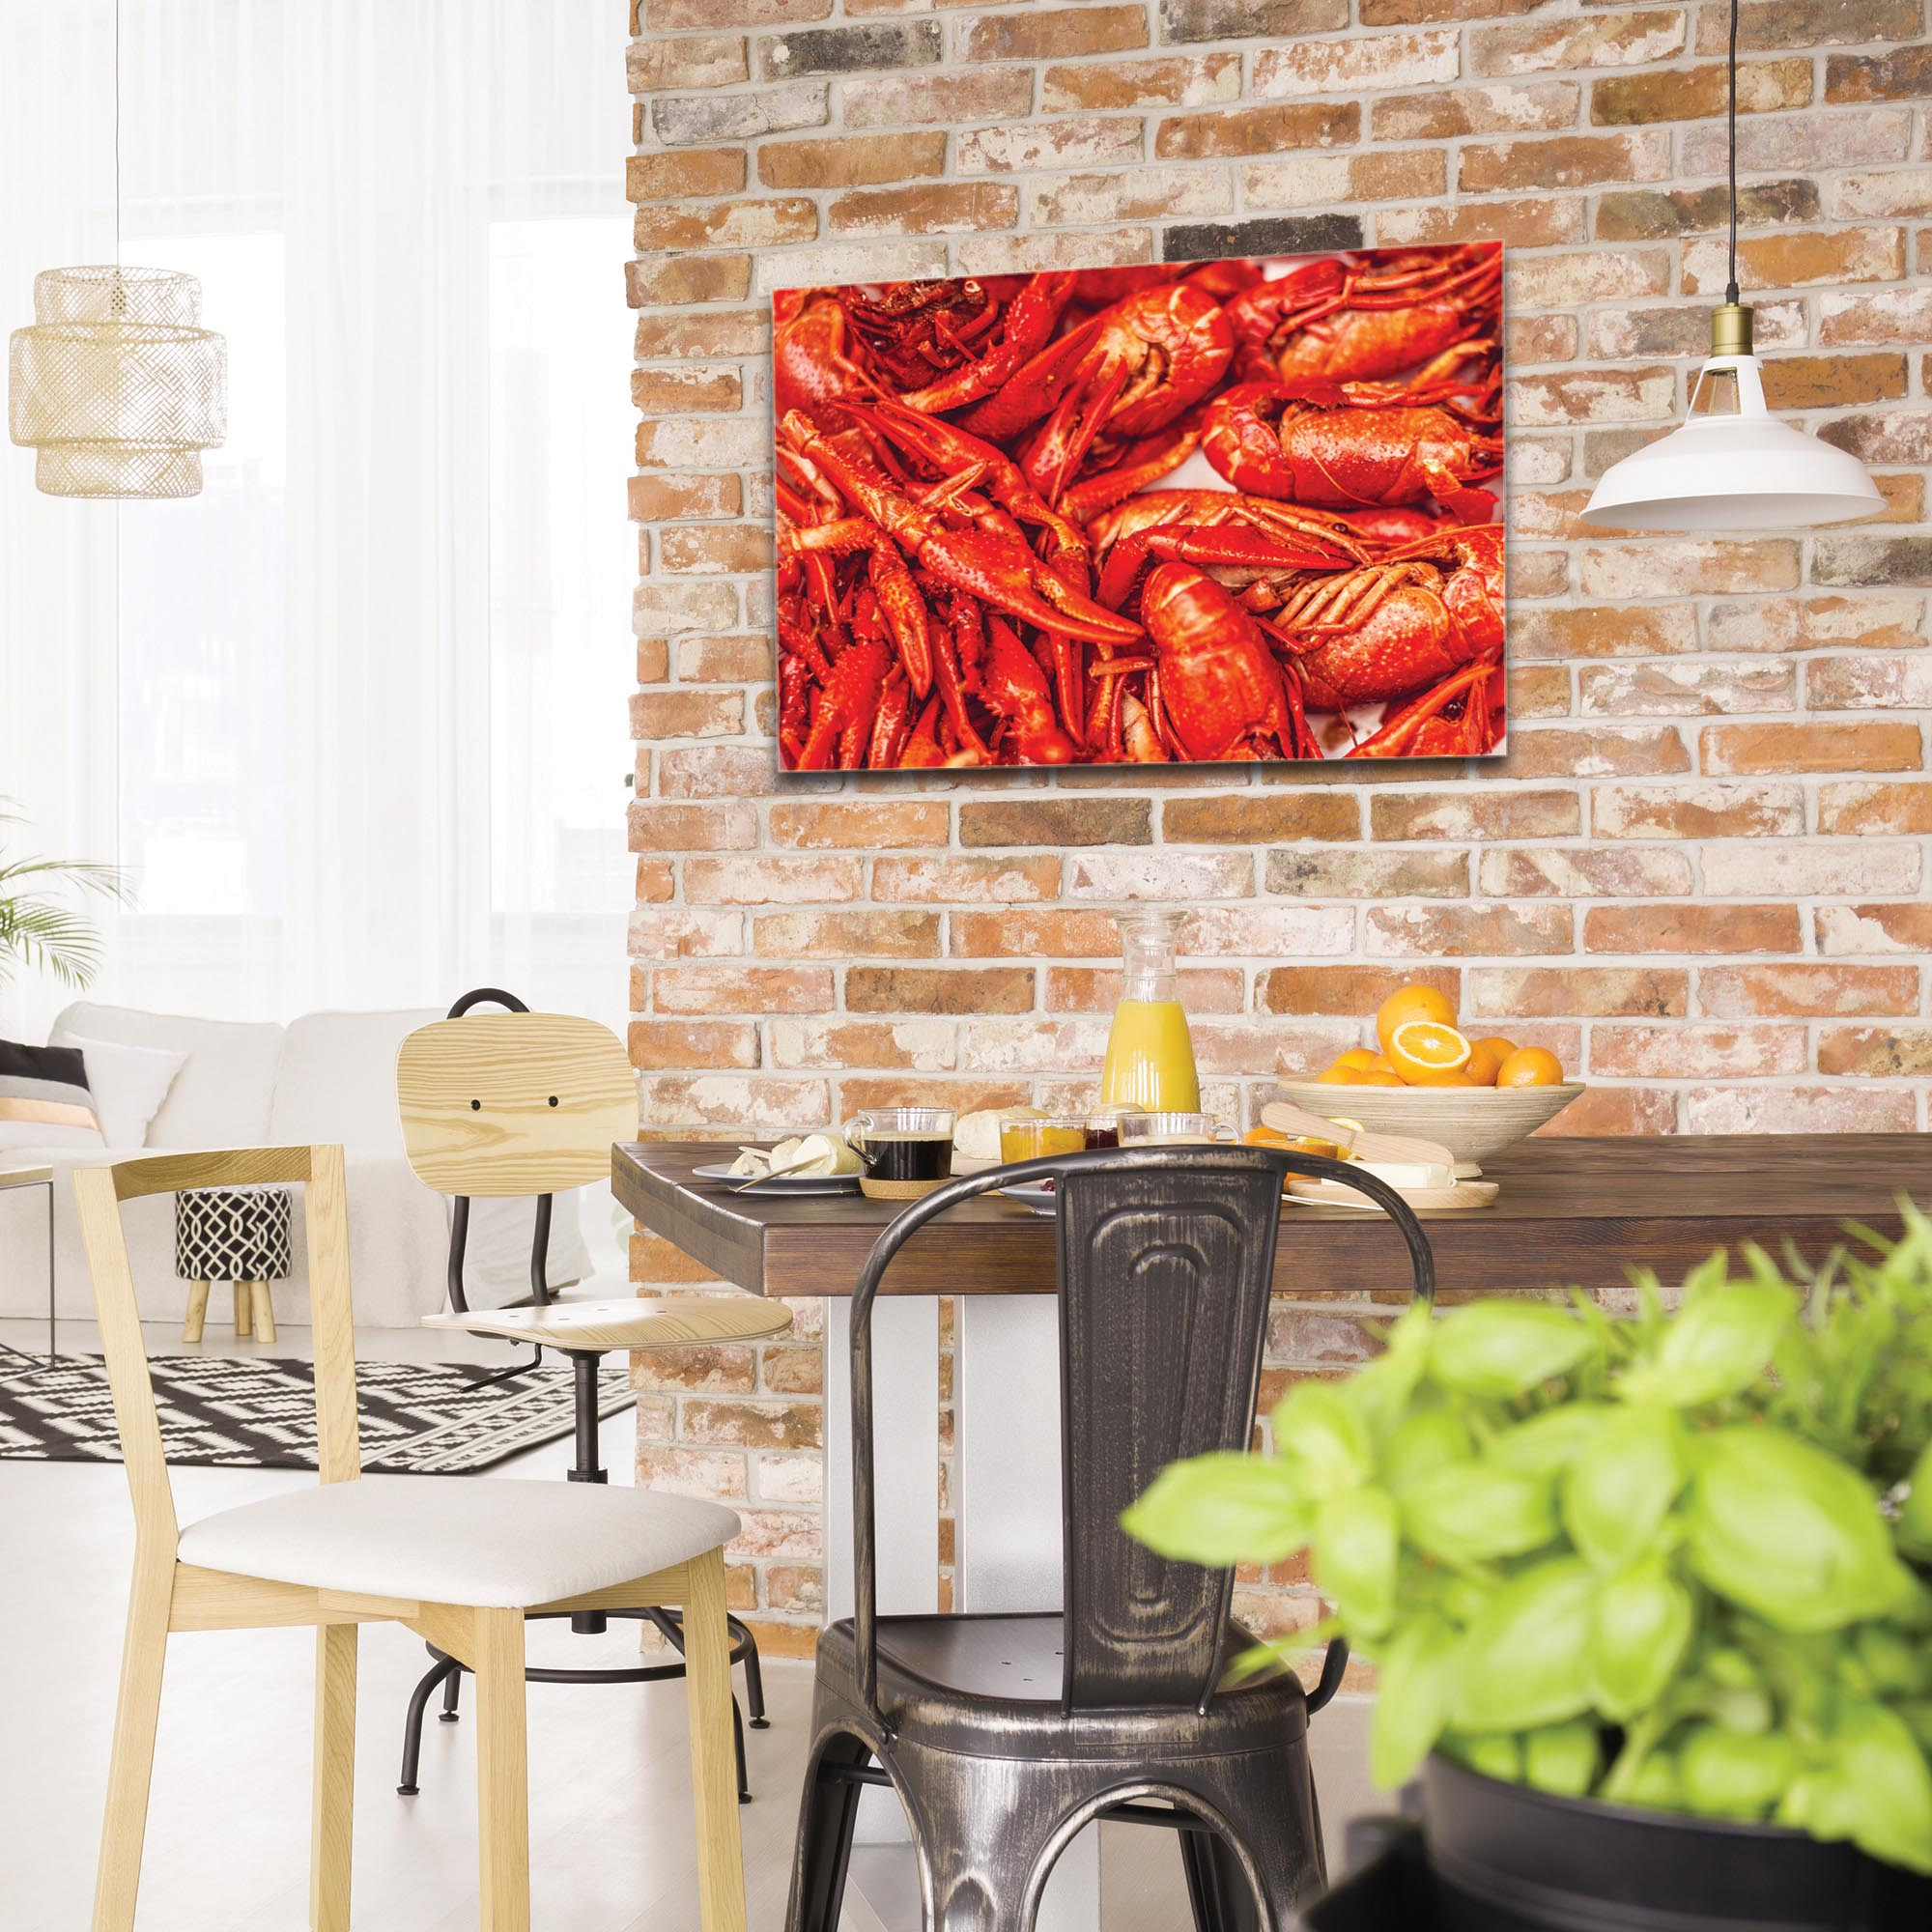 Coastal Wall Art 'Crawfish Supper' - Crayfish Boil Decor on Metal or Plexiglass - Image 3